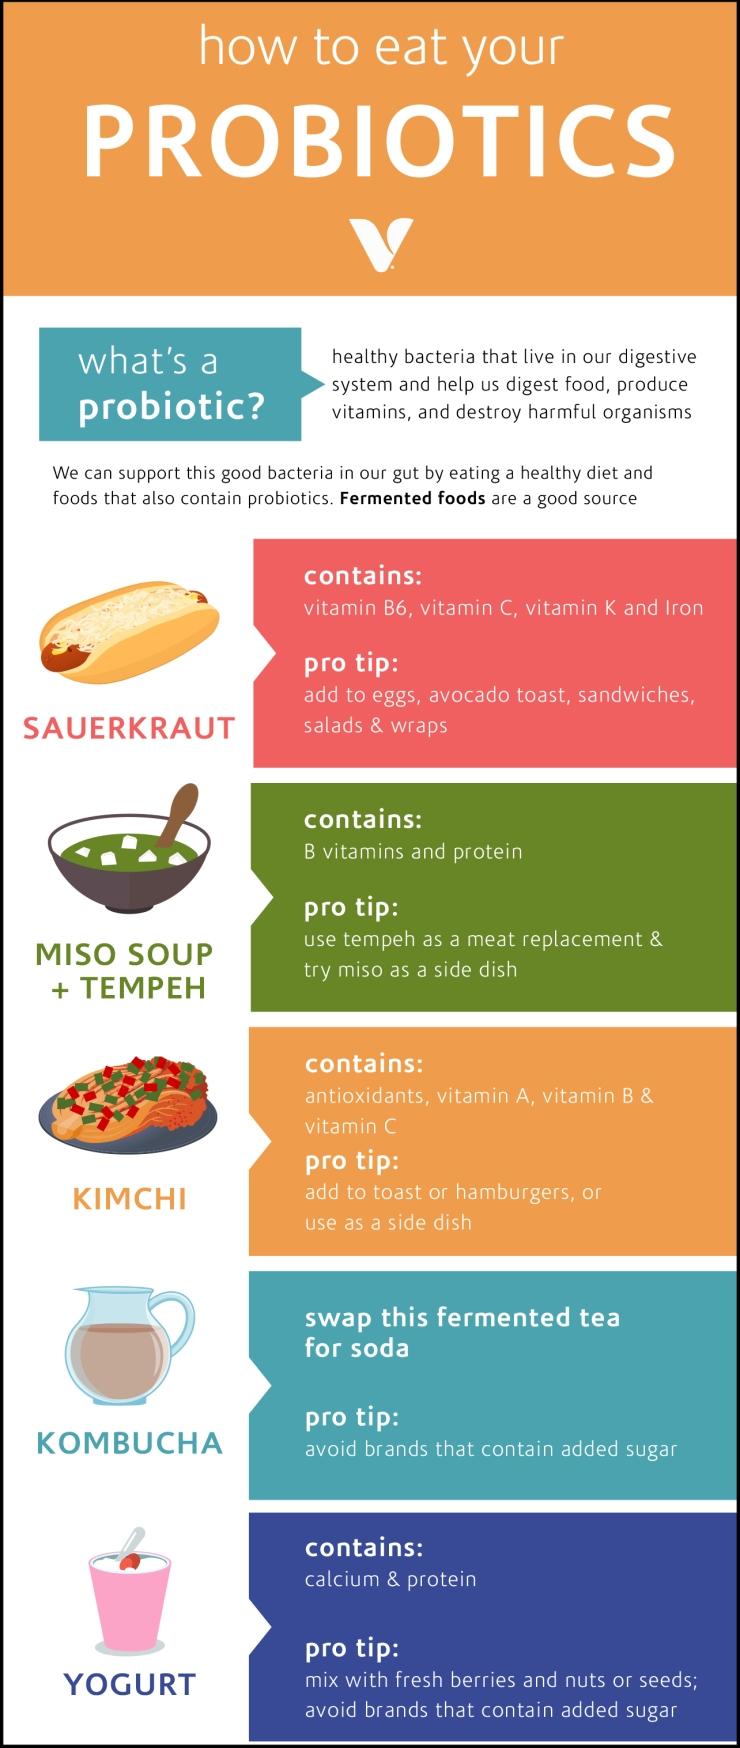 How To Eat Your Probiotics.jpg